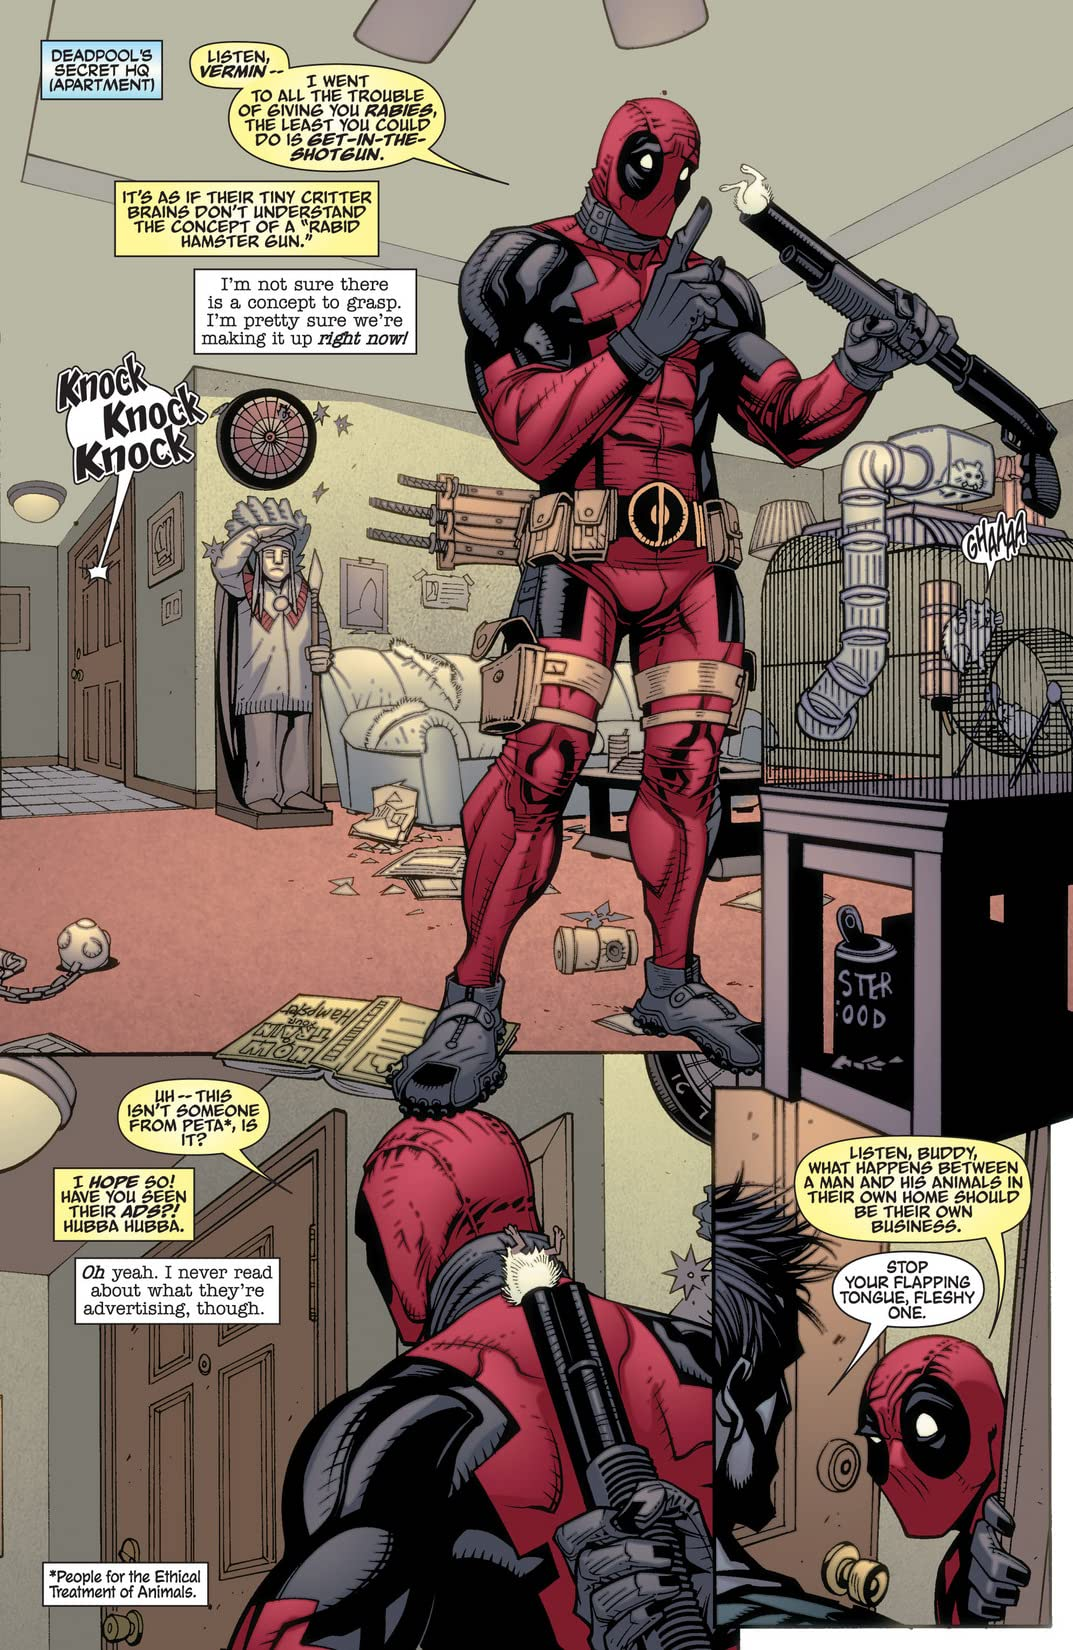 Deadpool Team-Up #890